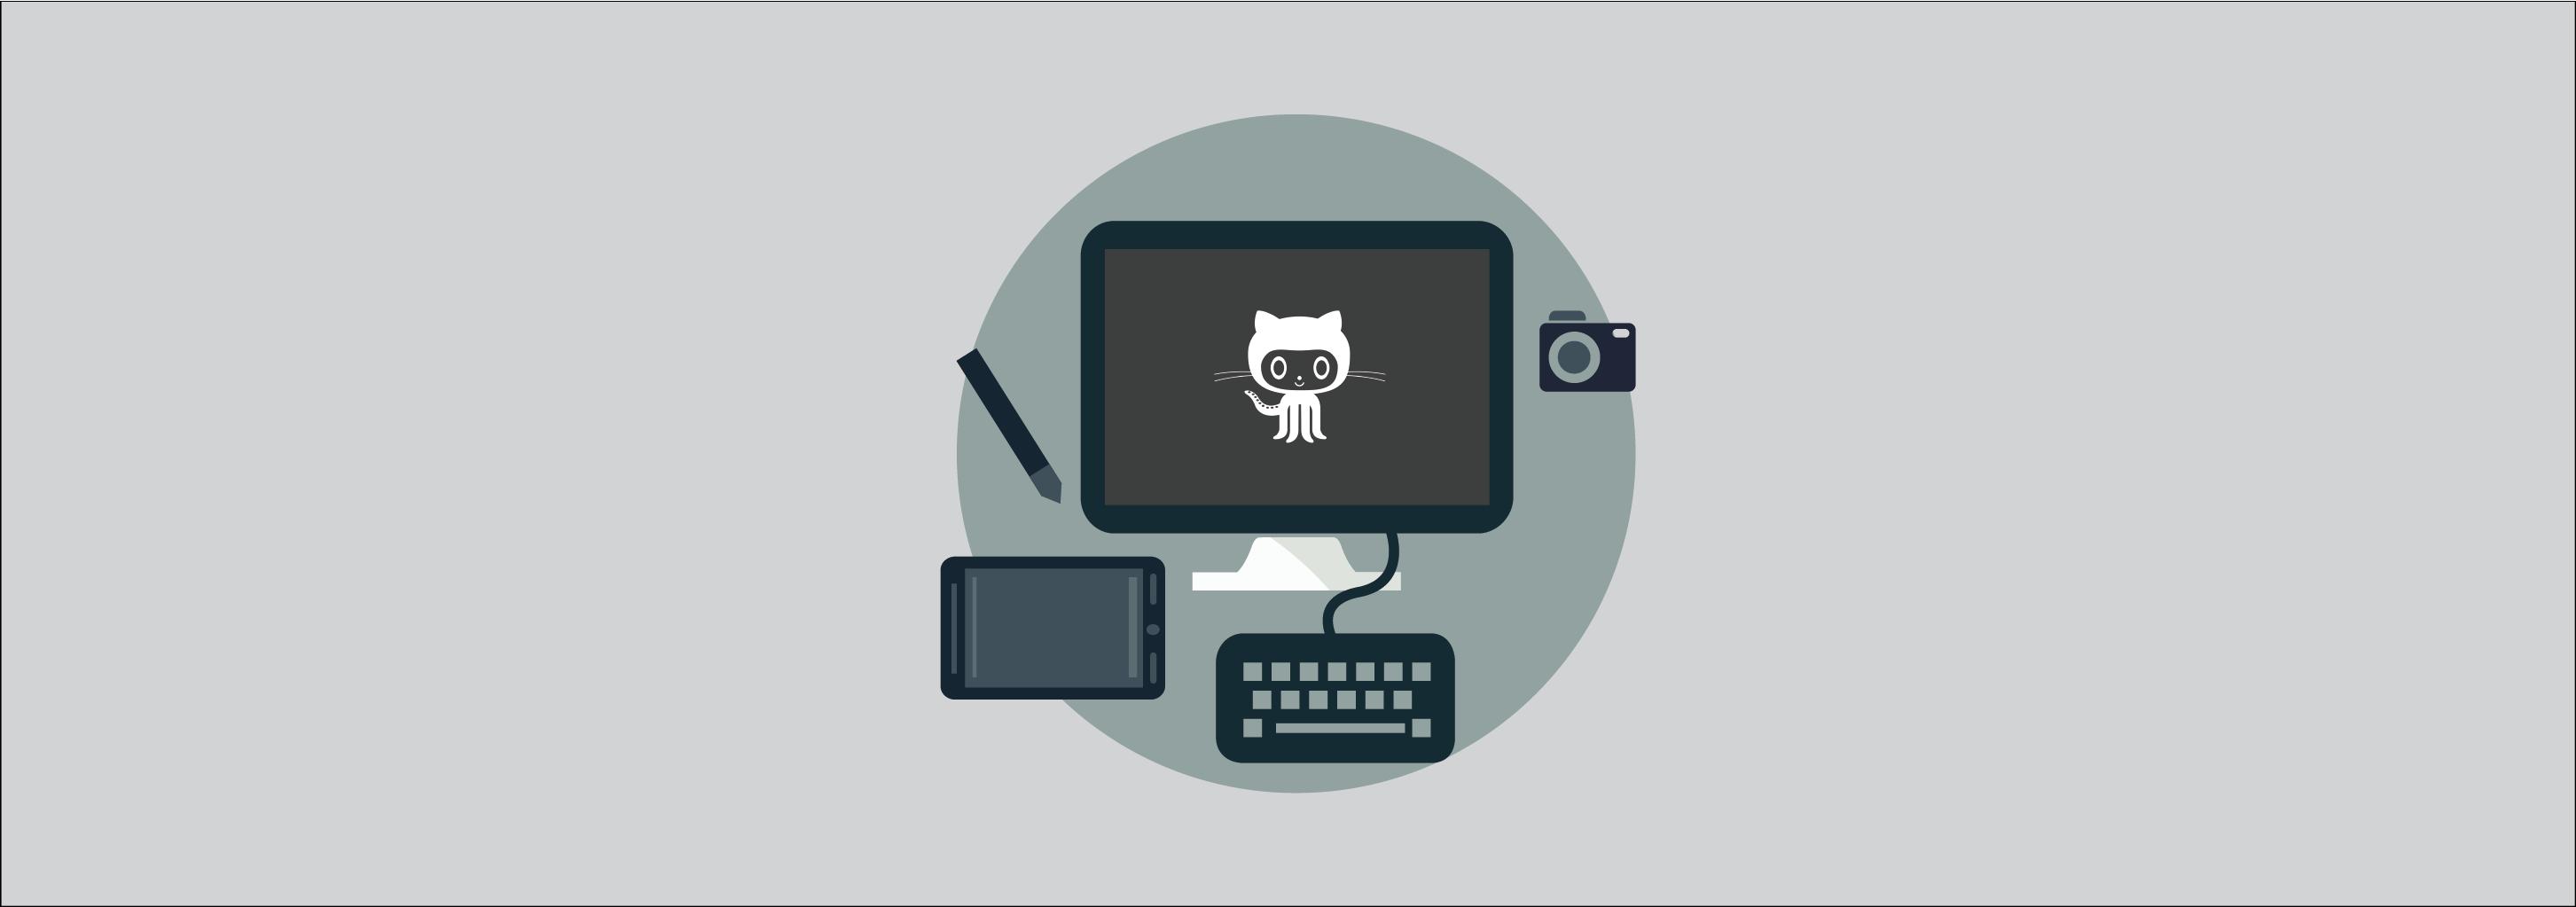 fir.im Weekly - 不能错过的 GitHub Top 100 开源库